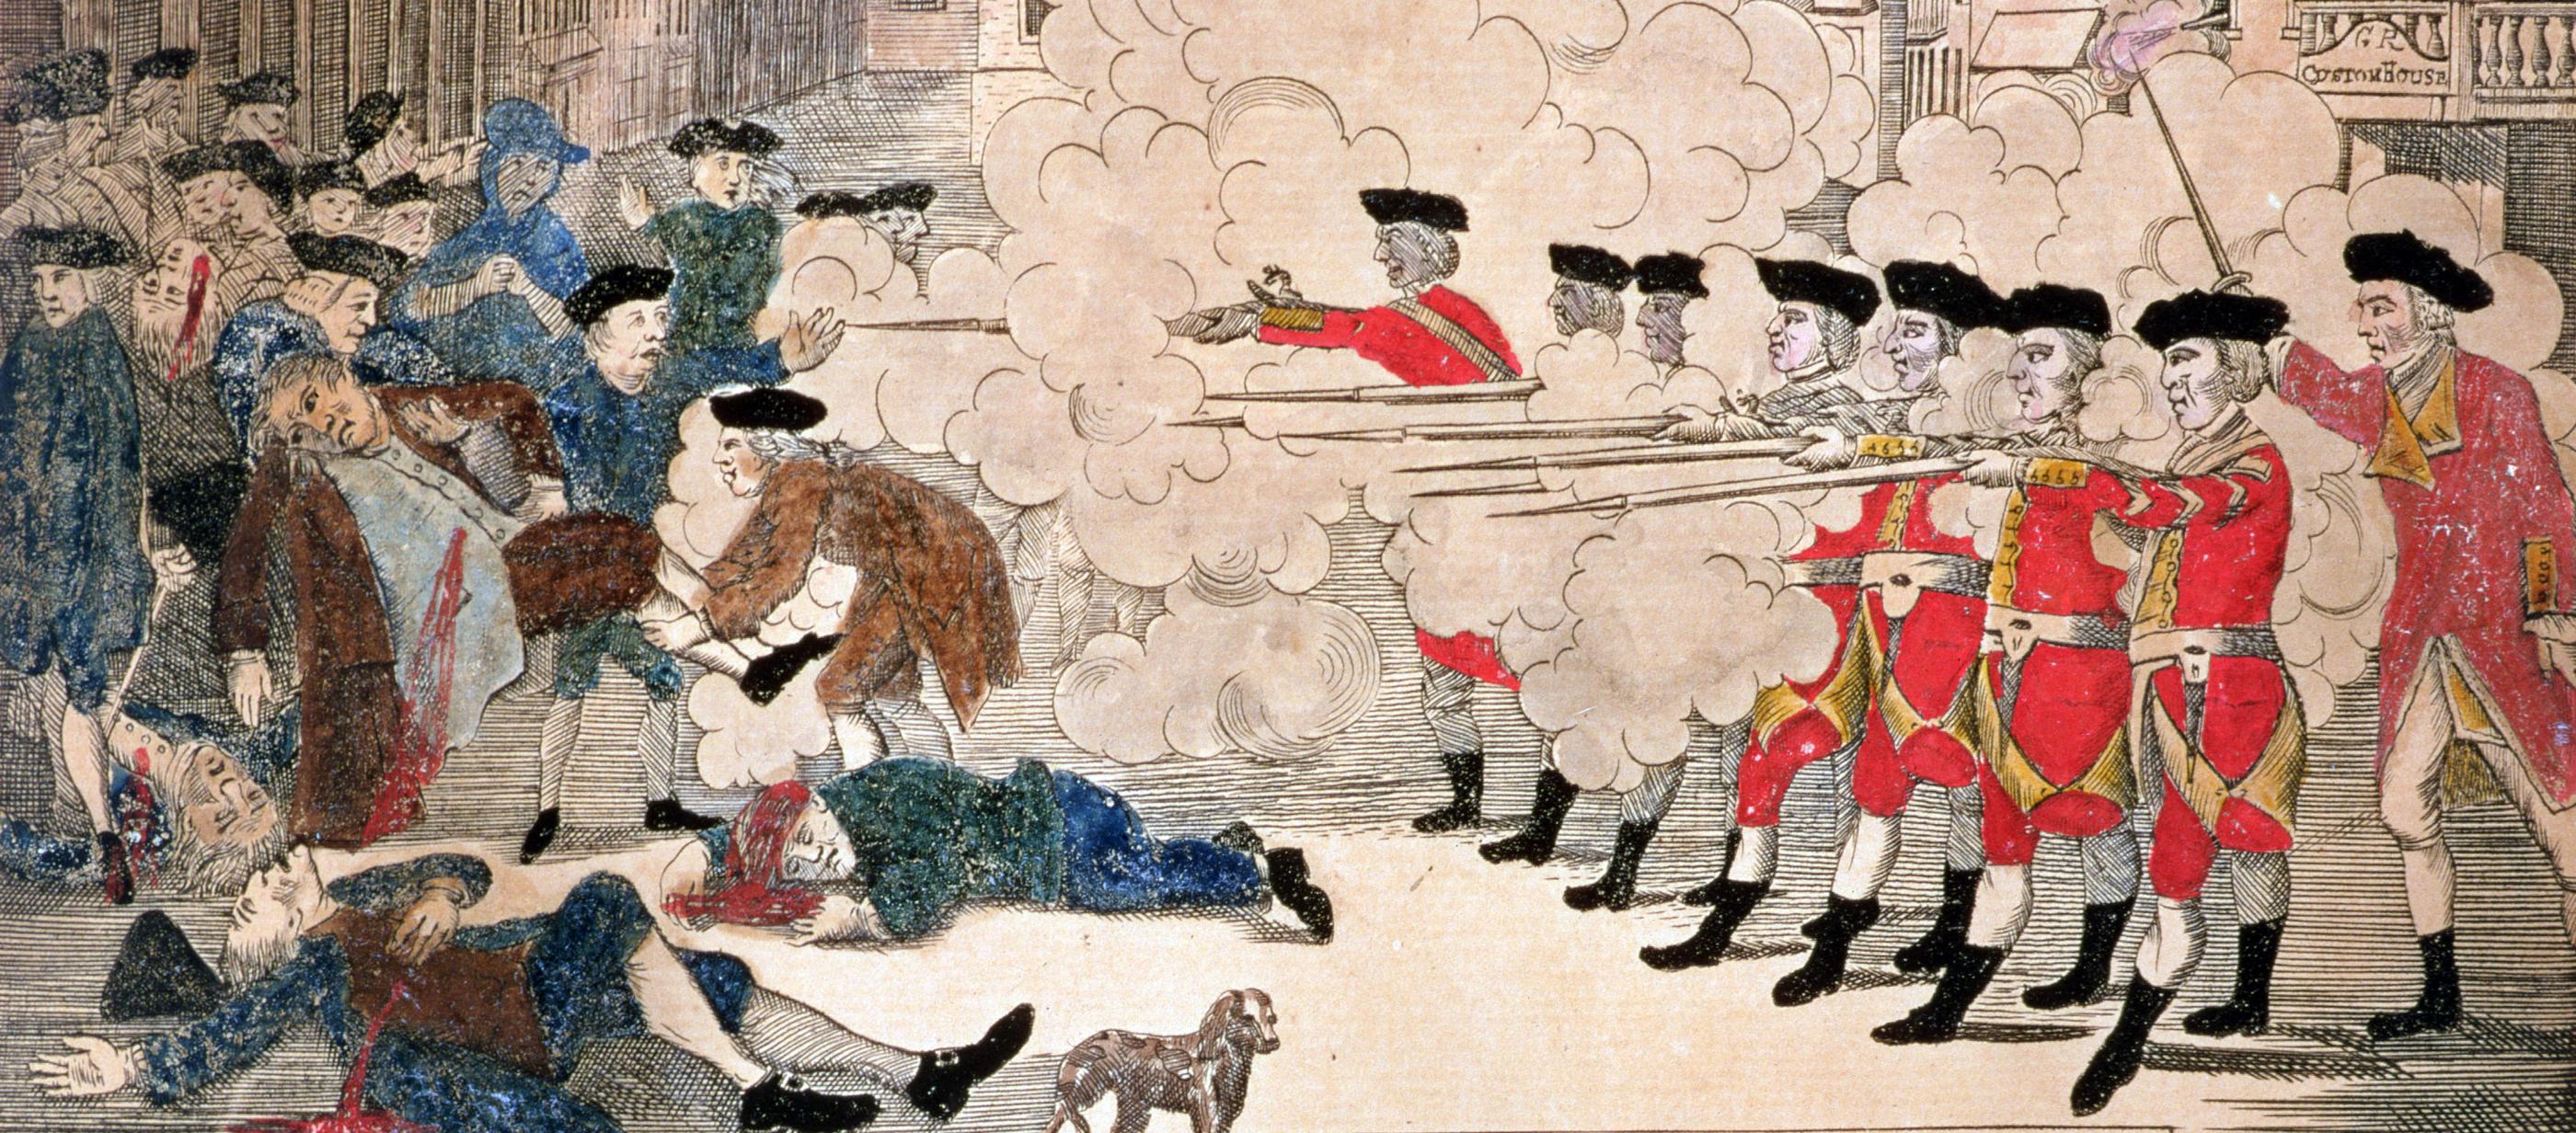 politics the bloody massacre lapham s quarterly the bloody massacre an engraving of the boston massacre by paul revere 1770